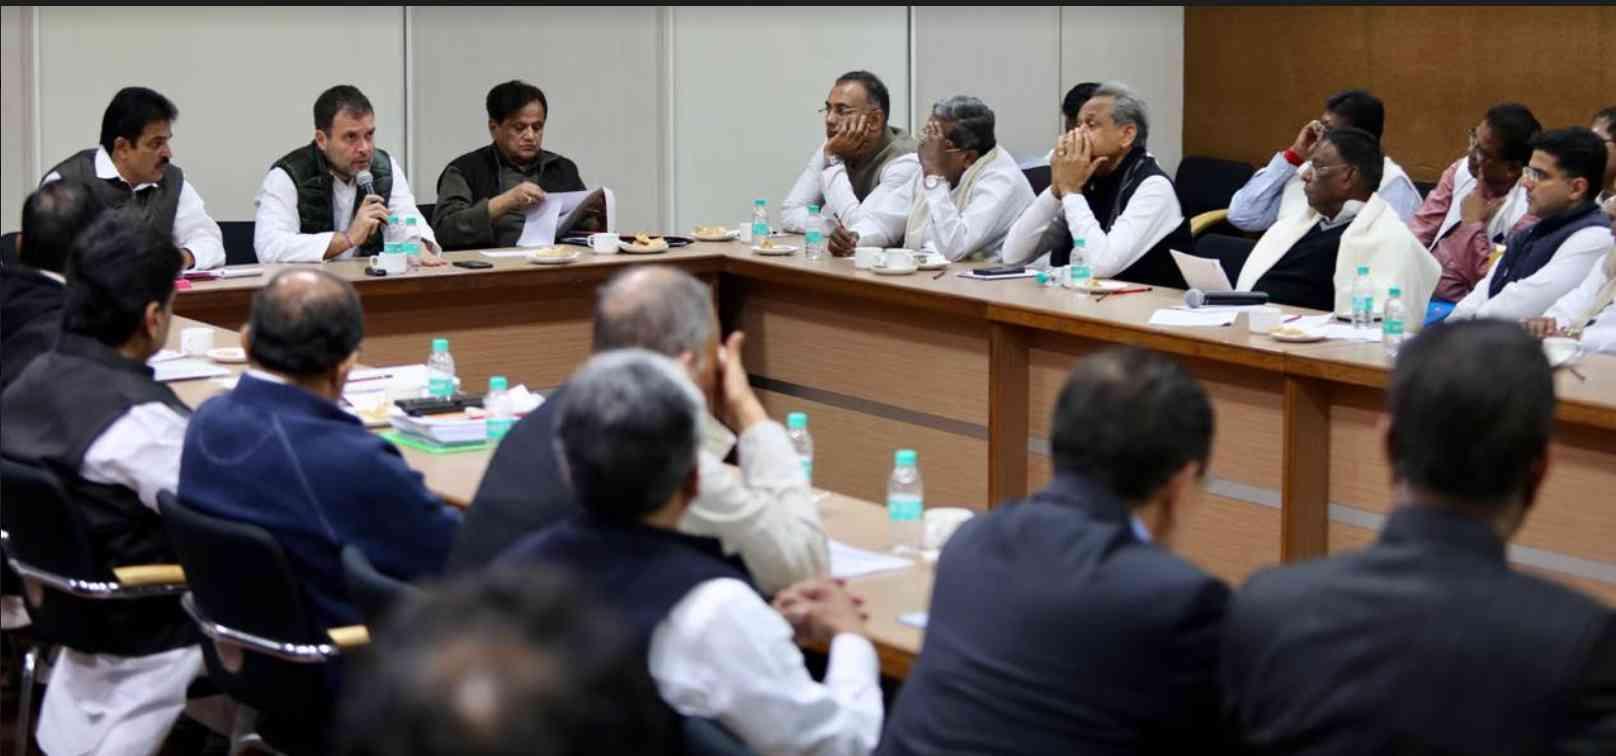 Rahul Gandhi ask Congress leaders to focus on Modi govt anti people policies - Satya Hindi